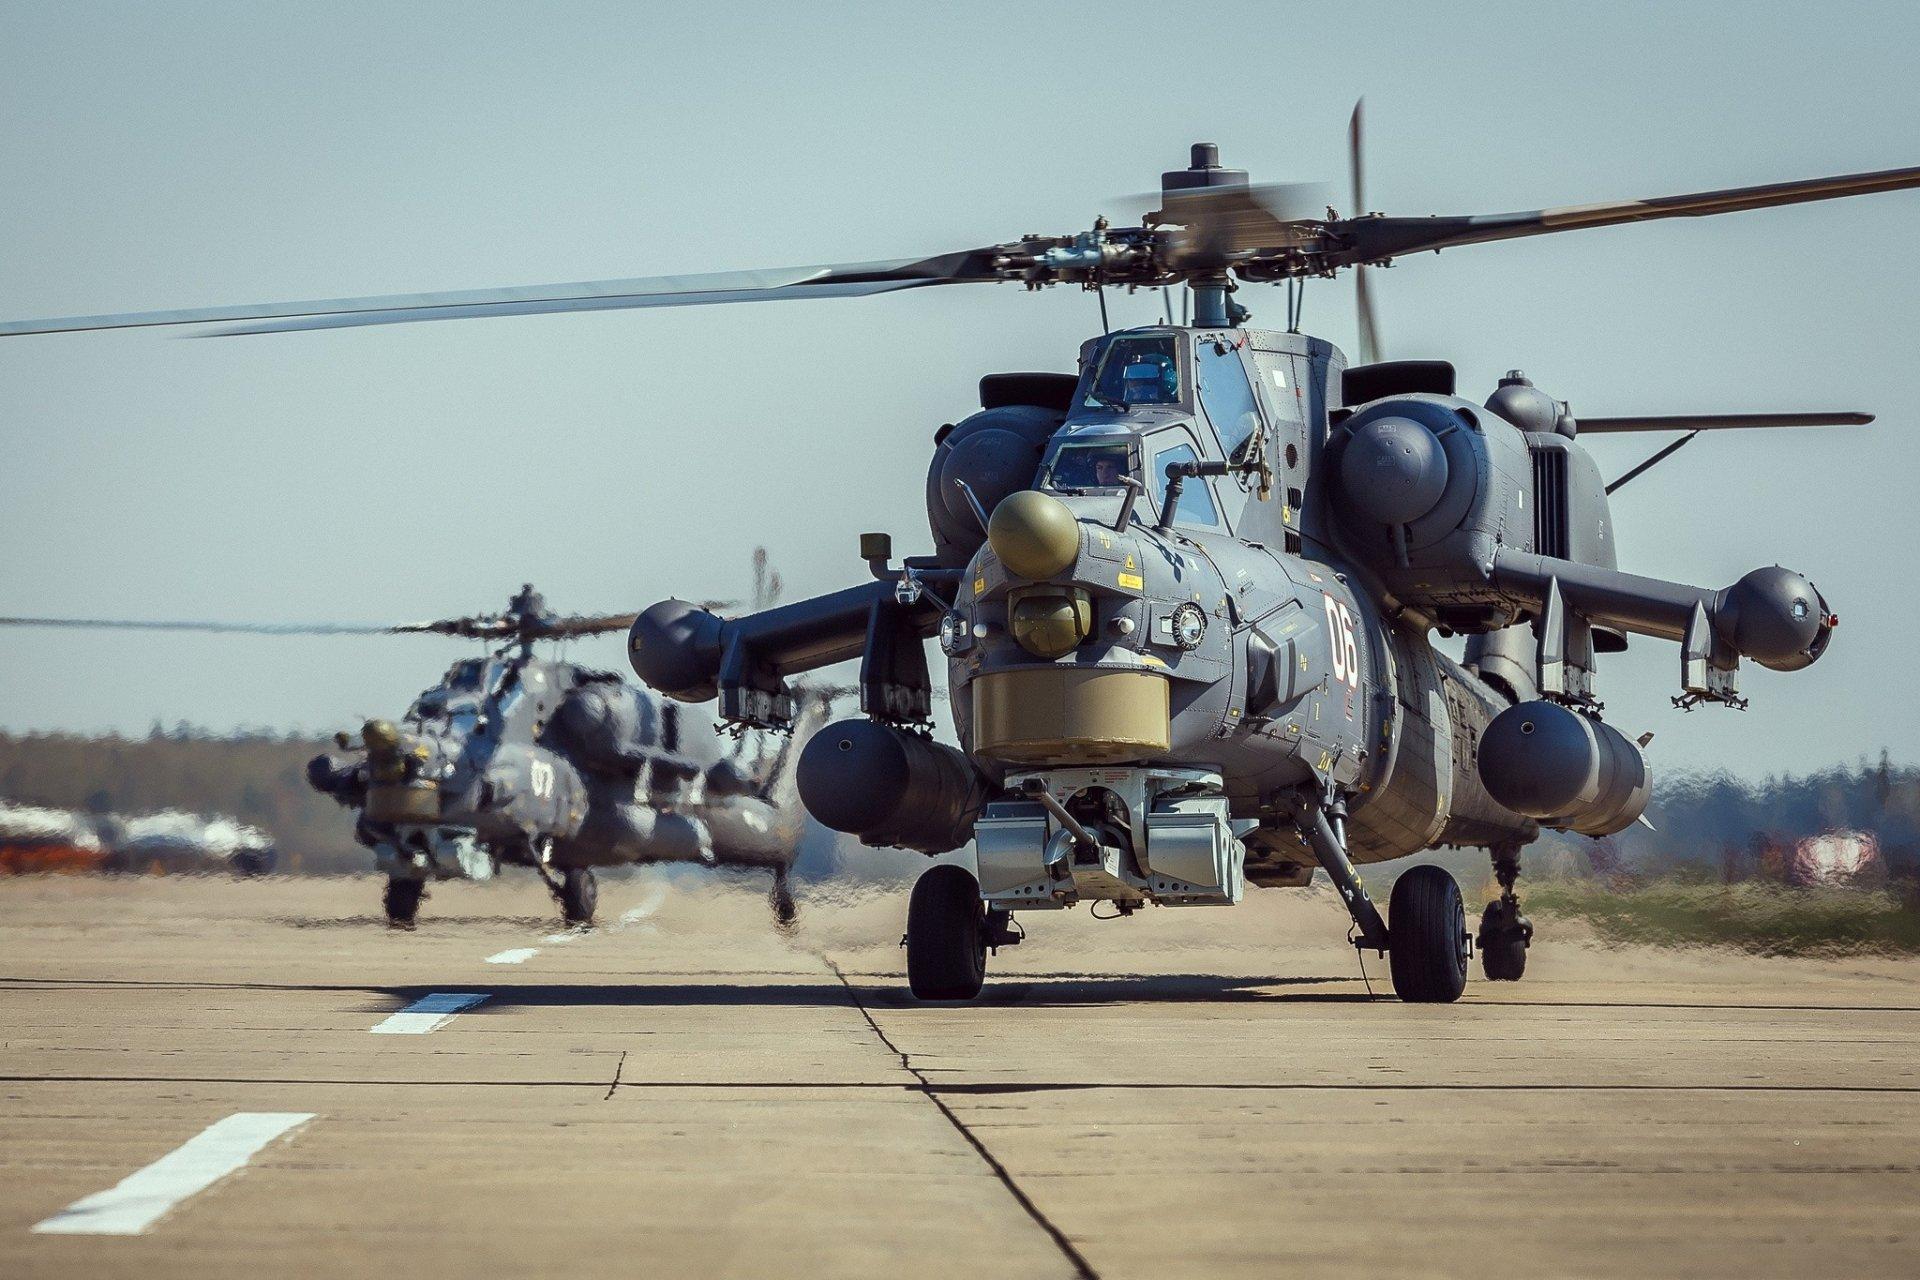 Helicoptero Hd Fondos De Escritorio: Mi-28 Helicopter Fondo De Pantalla HD